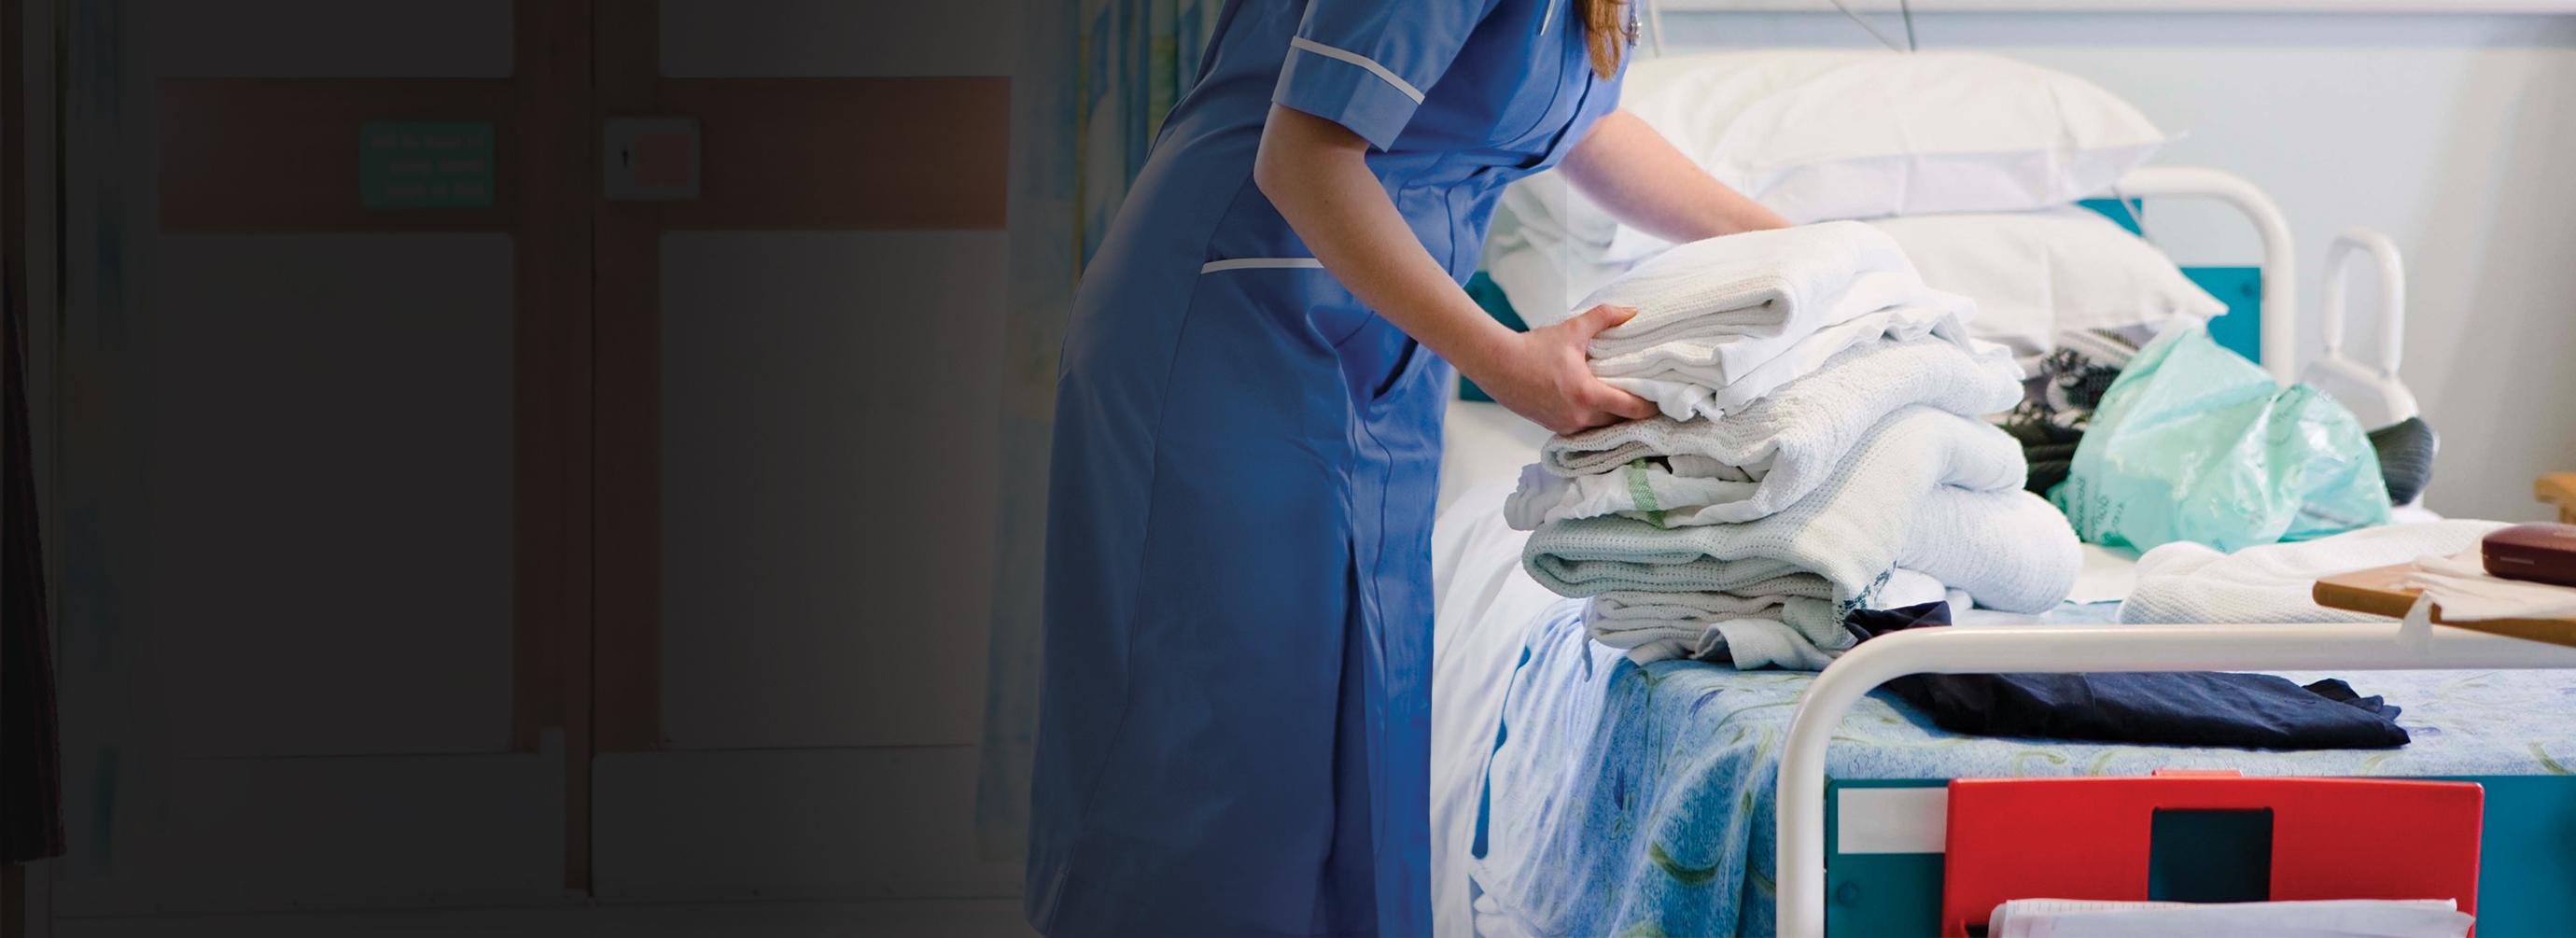 Laundry-Service